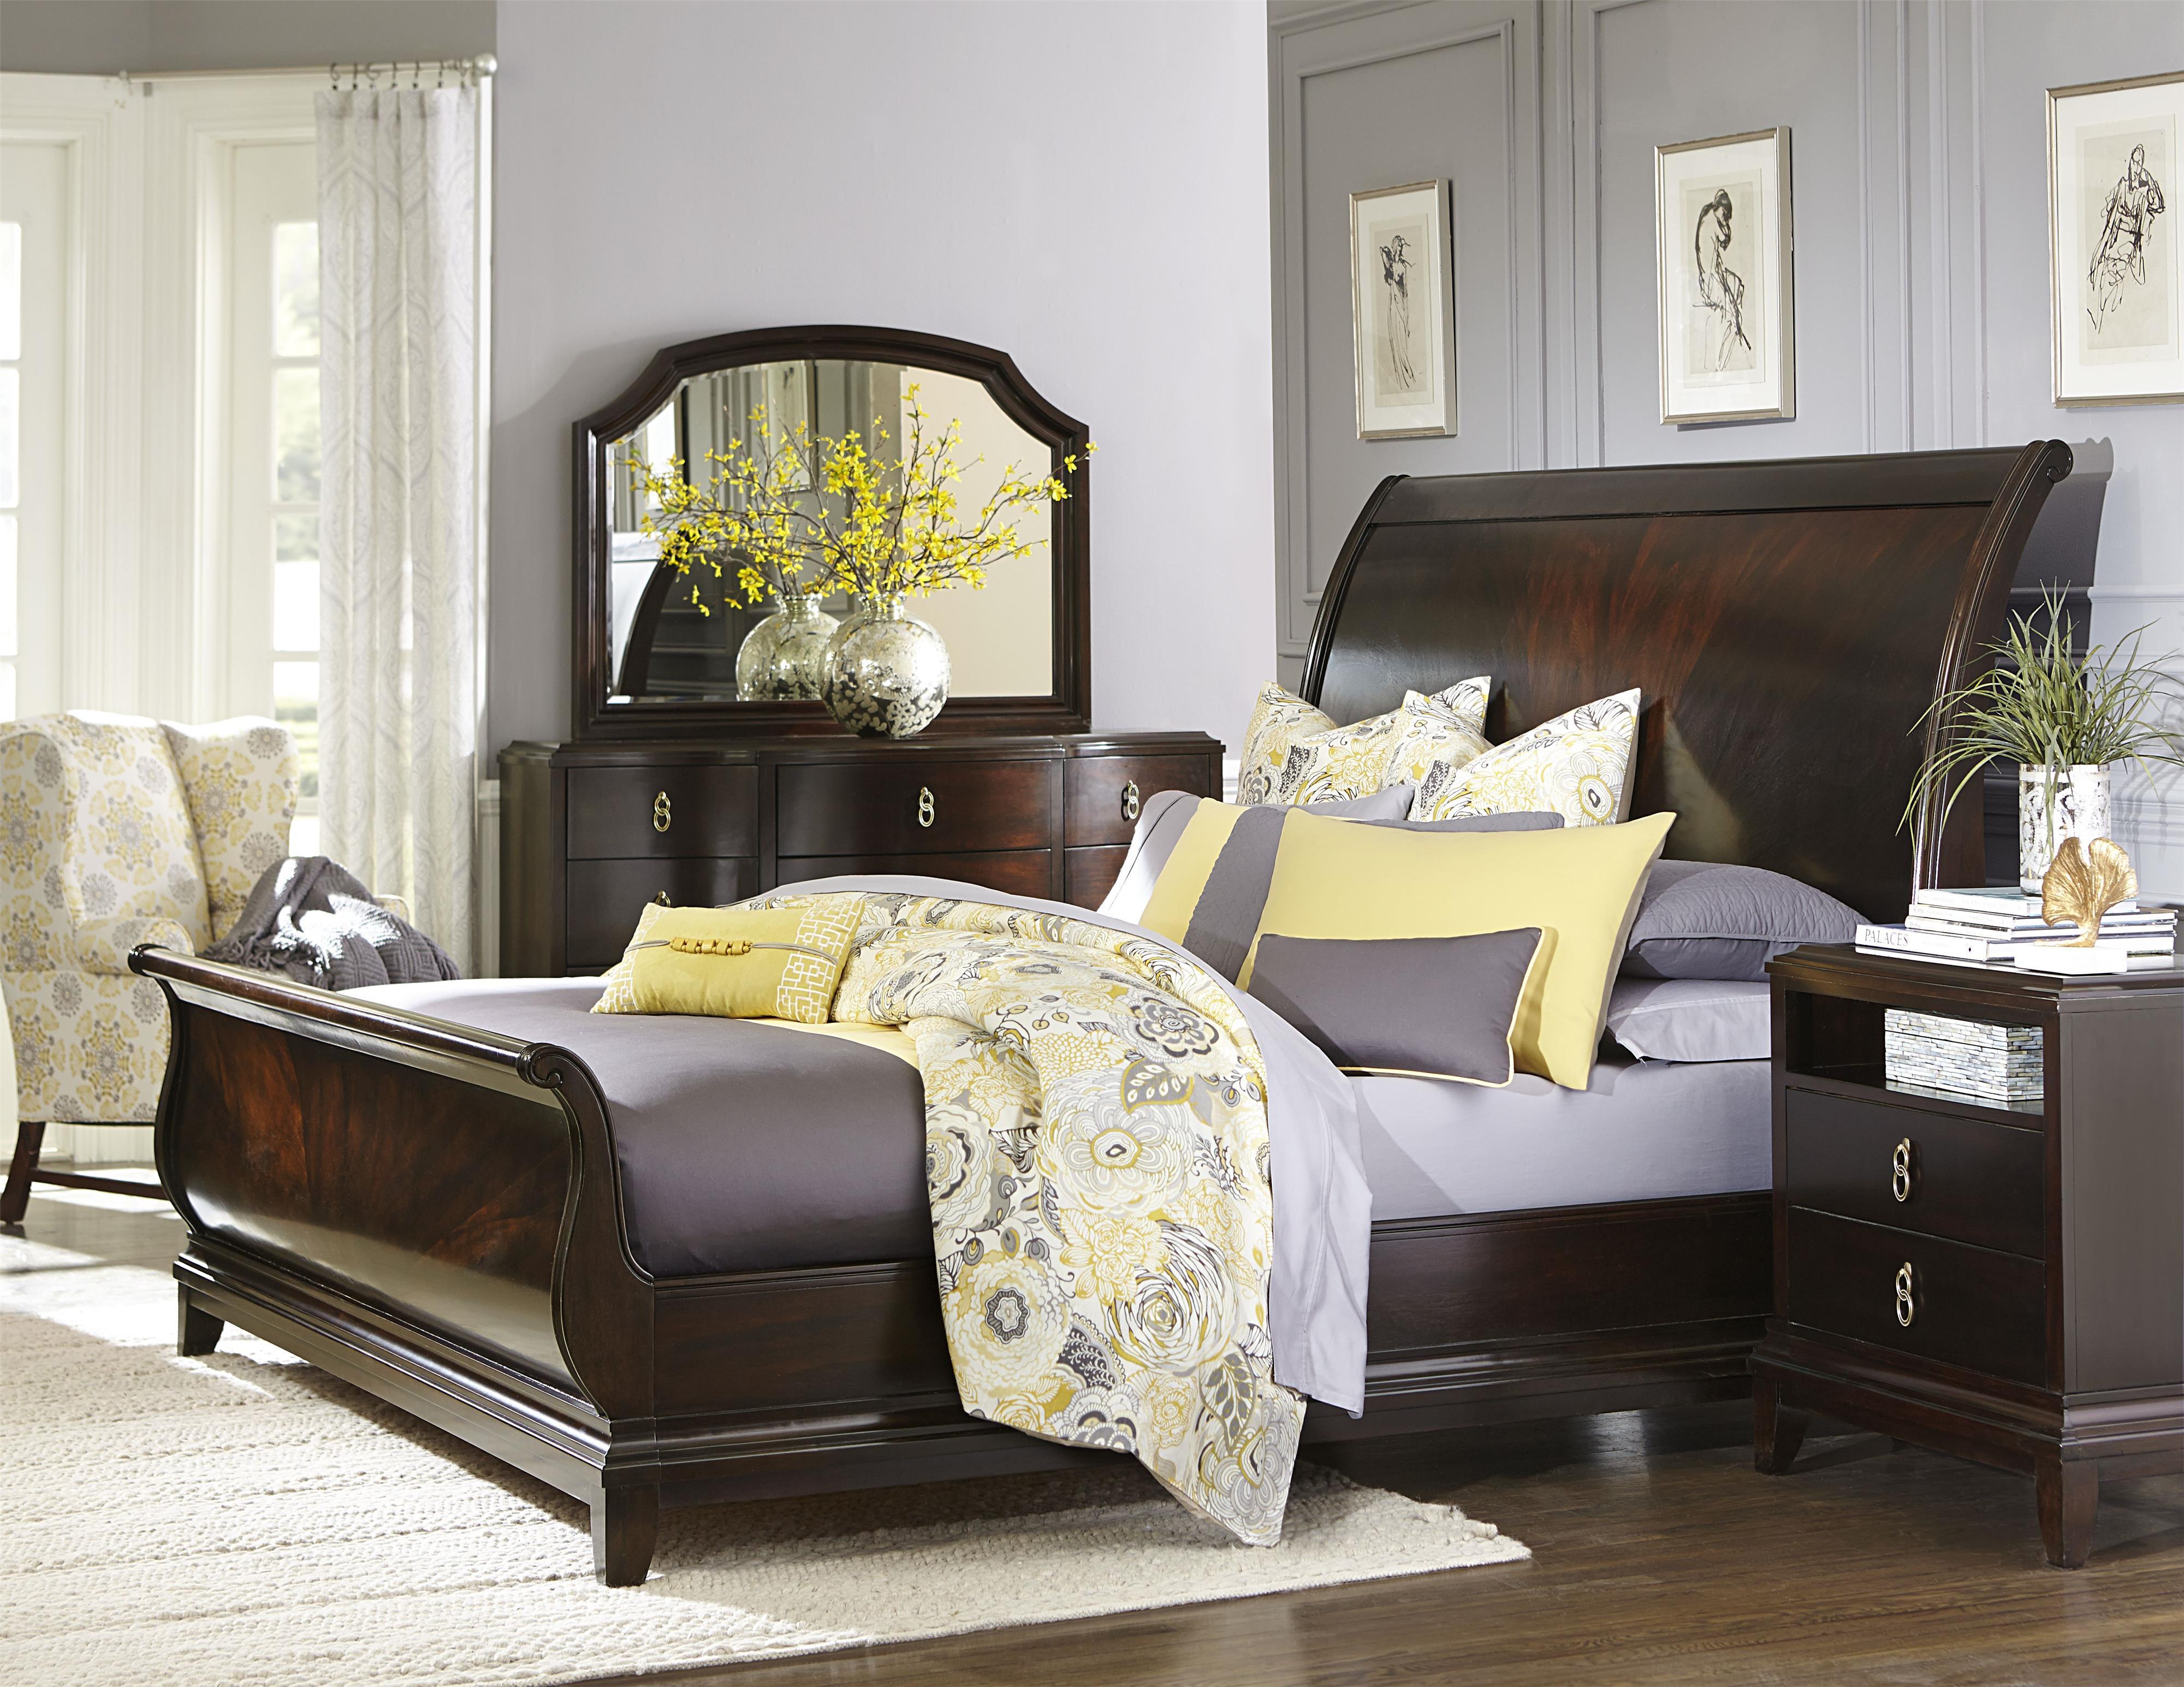 Legacy Classic Sophia California King Bedroom Group 1 - Item Number: 4450 CK Bedroom Group 1